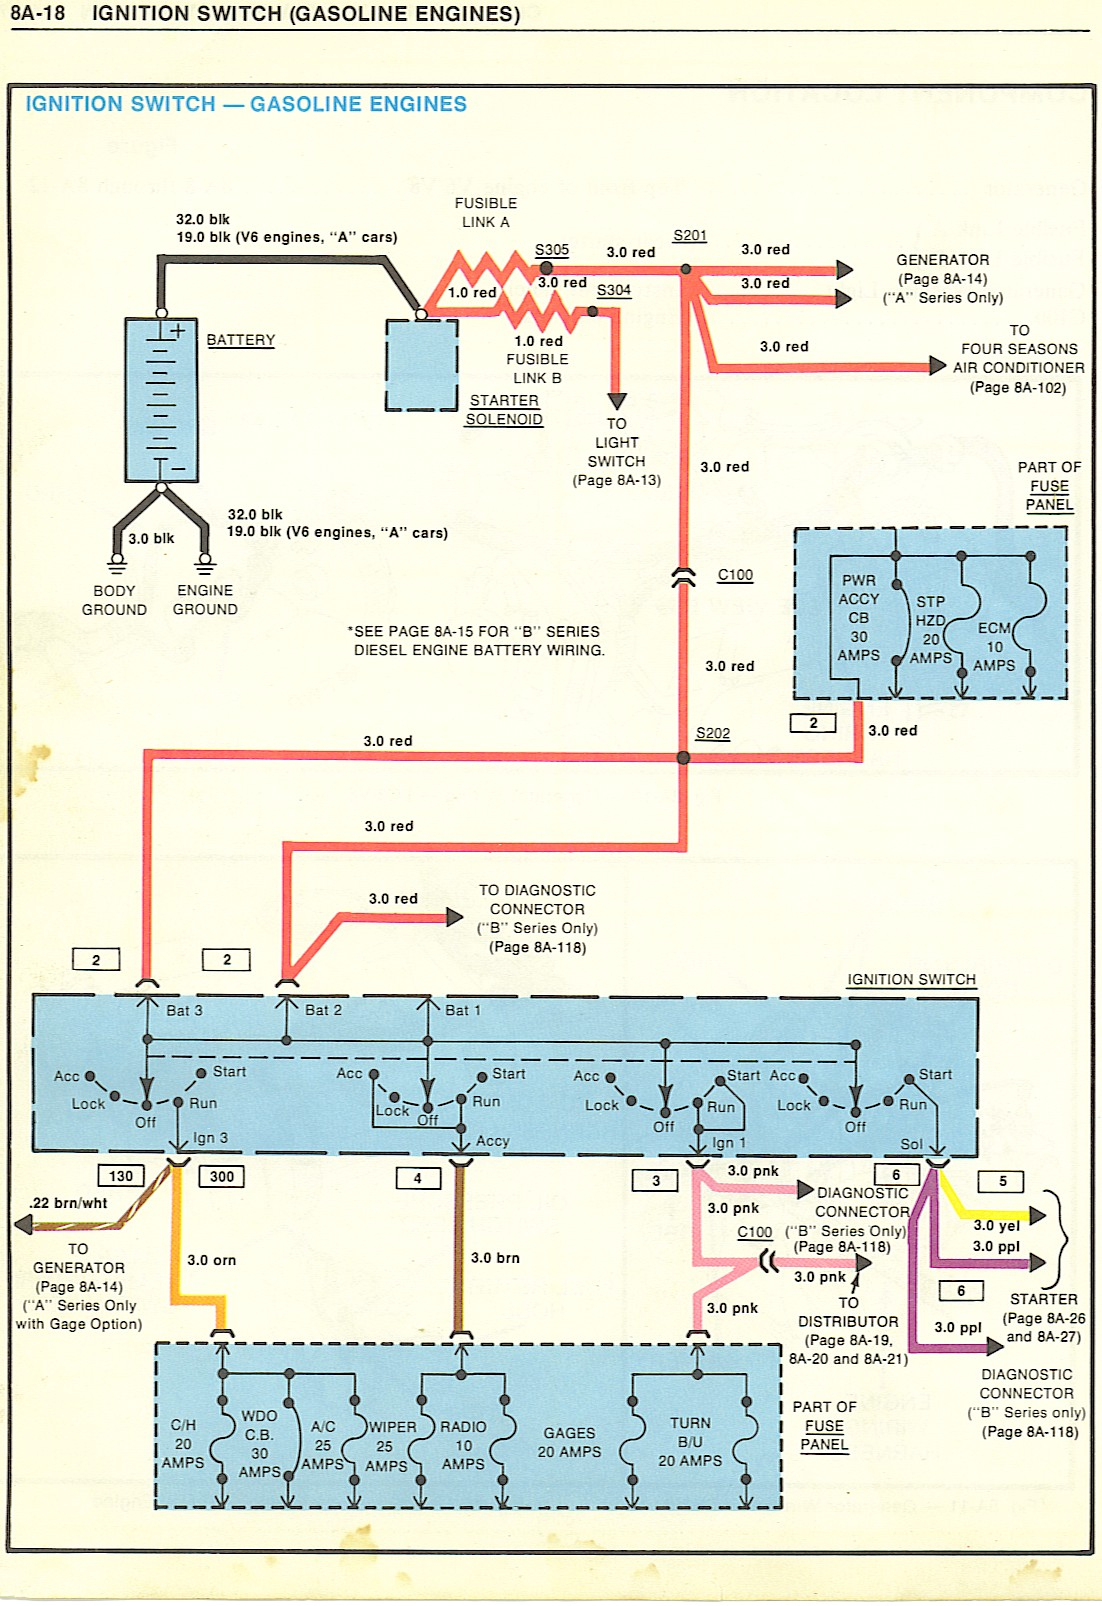 1969 Gm Ignition Switch Wiring Diagram | Wiring Diagram - Kubota Ignition Switch Wiring Diagram